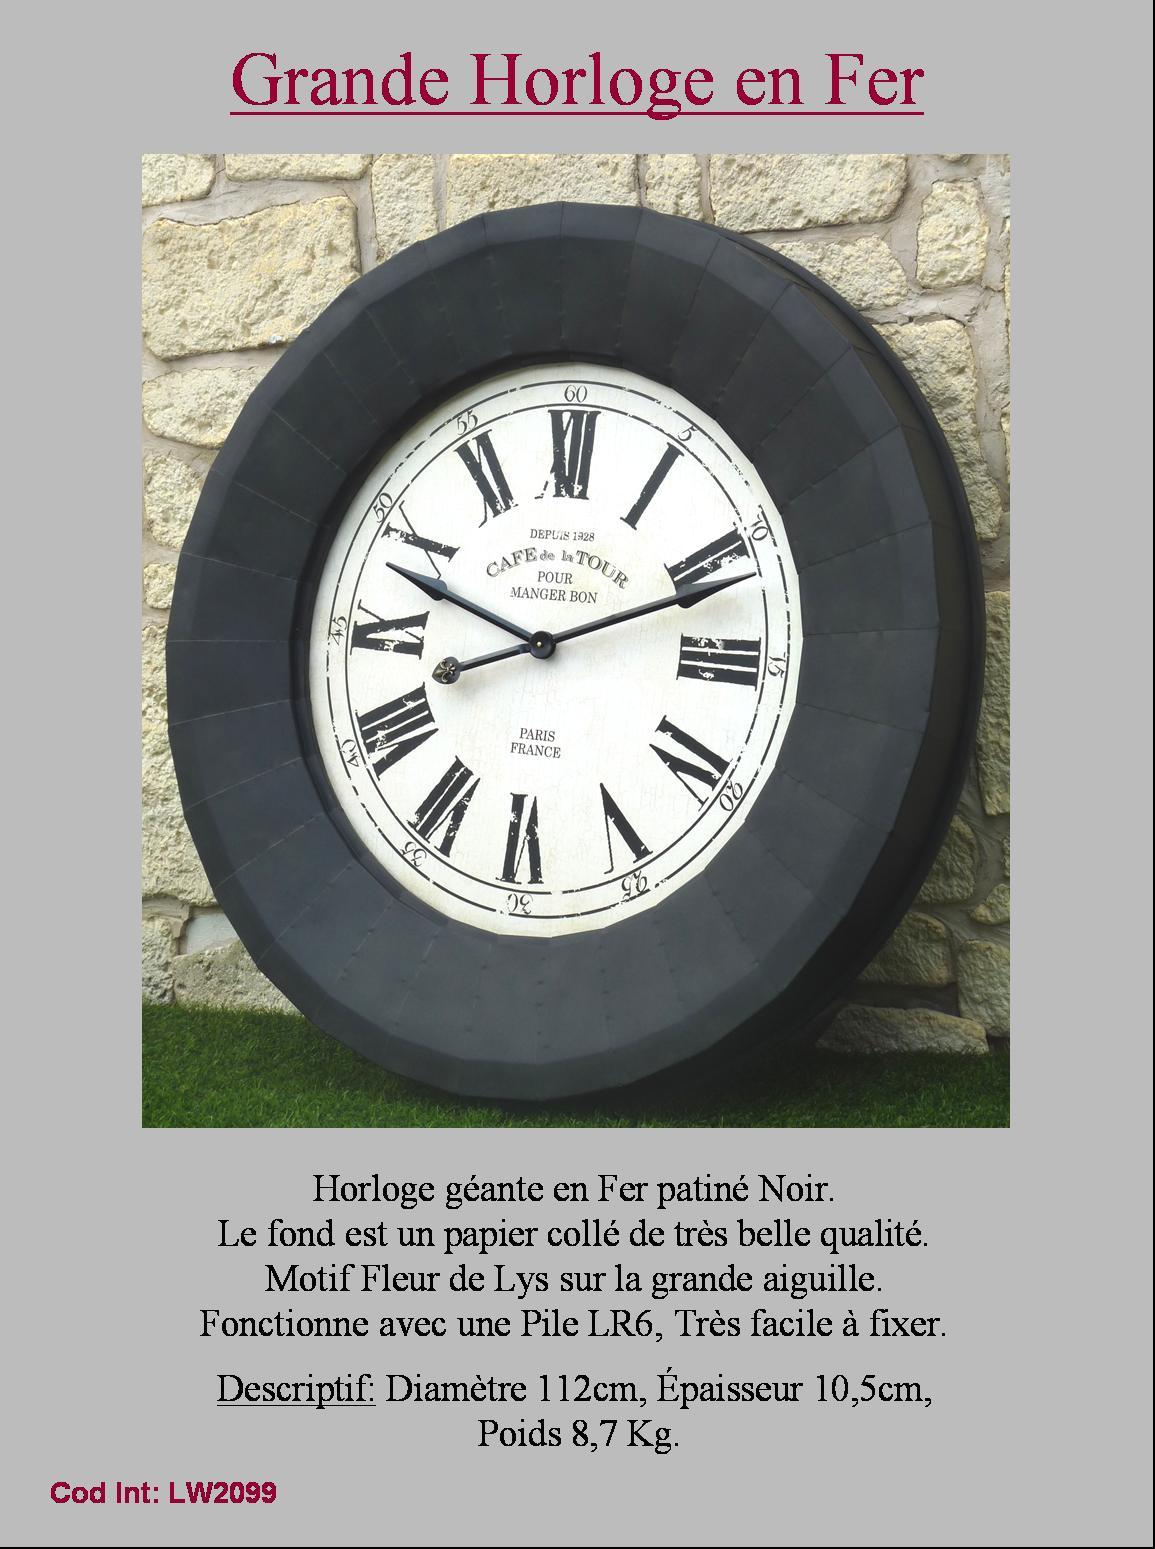 Geante grande horloge industriel usine loft murale cadre cadran en fer 112cm ebay for Horloge en fer